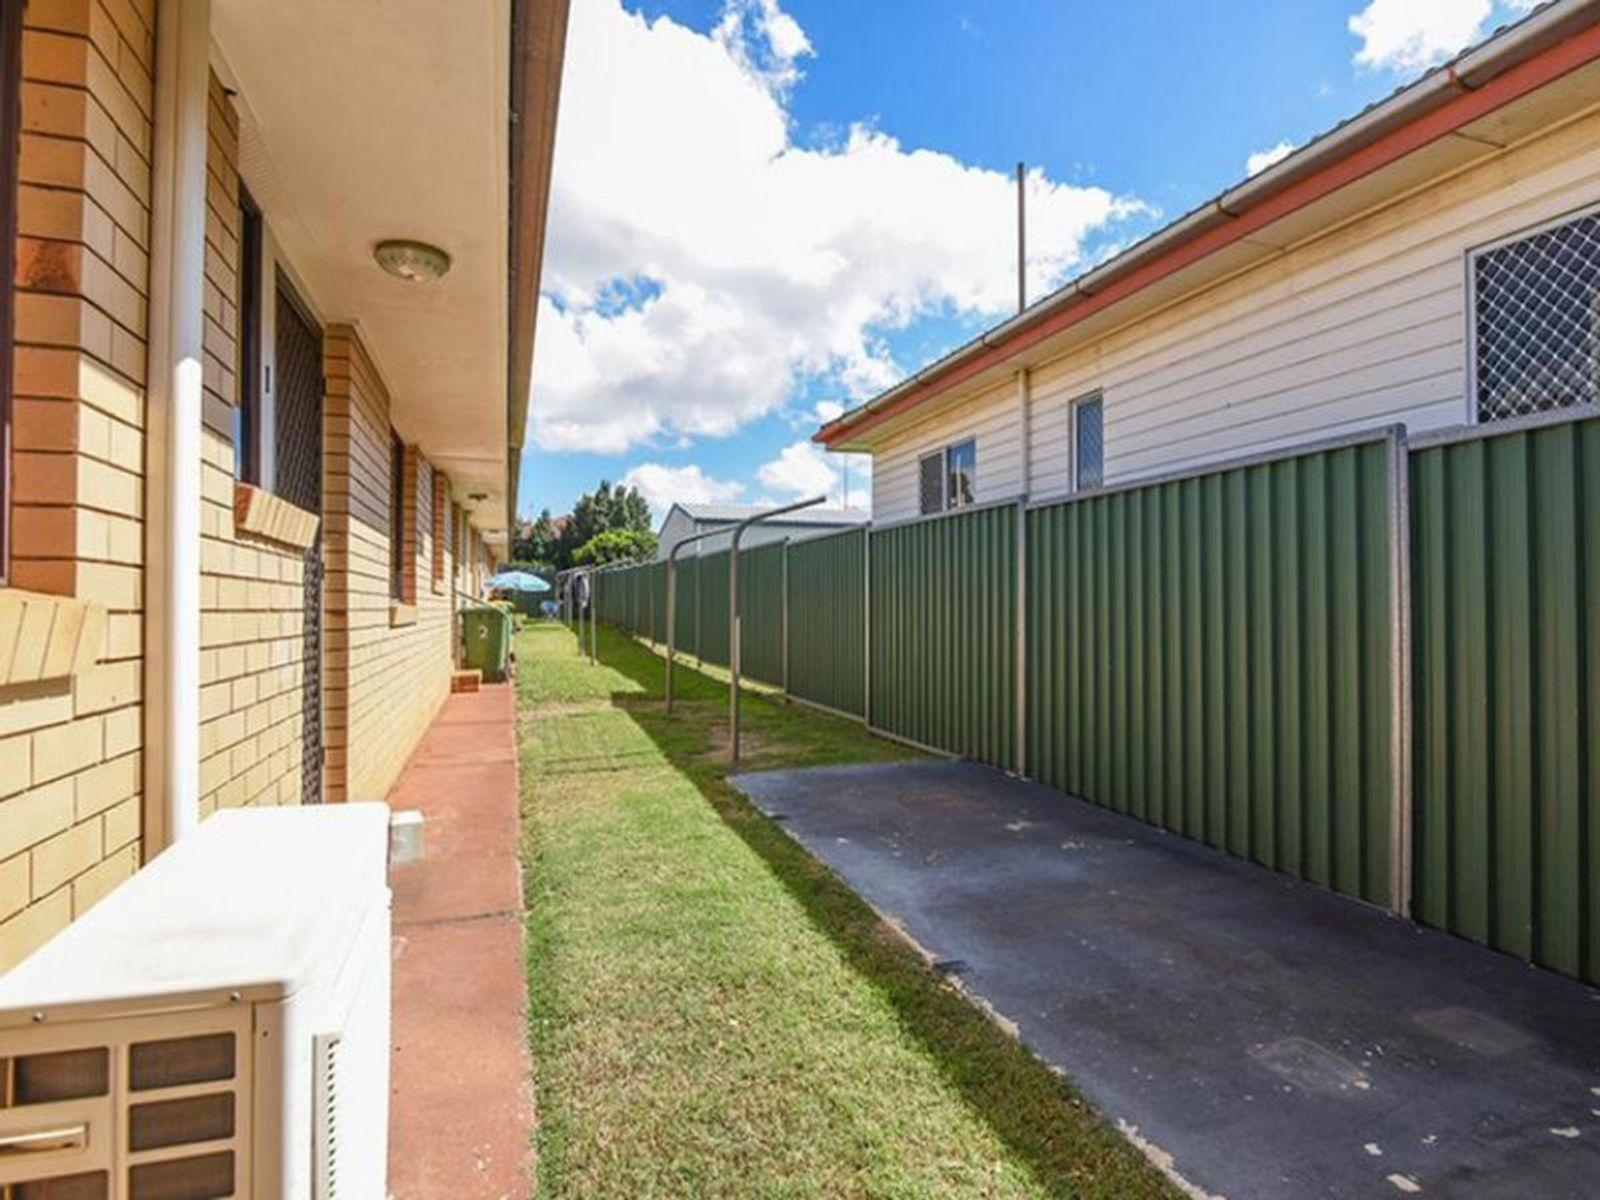 1/343 West Street, Harristown, QLD 4350